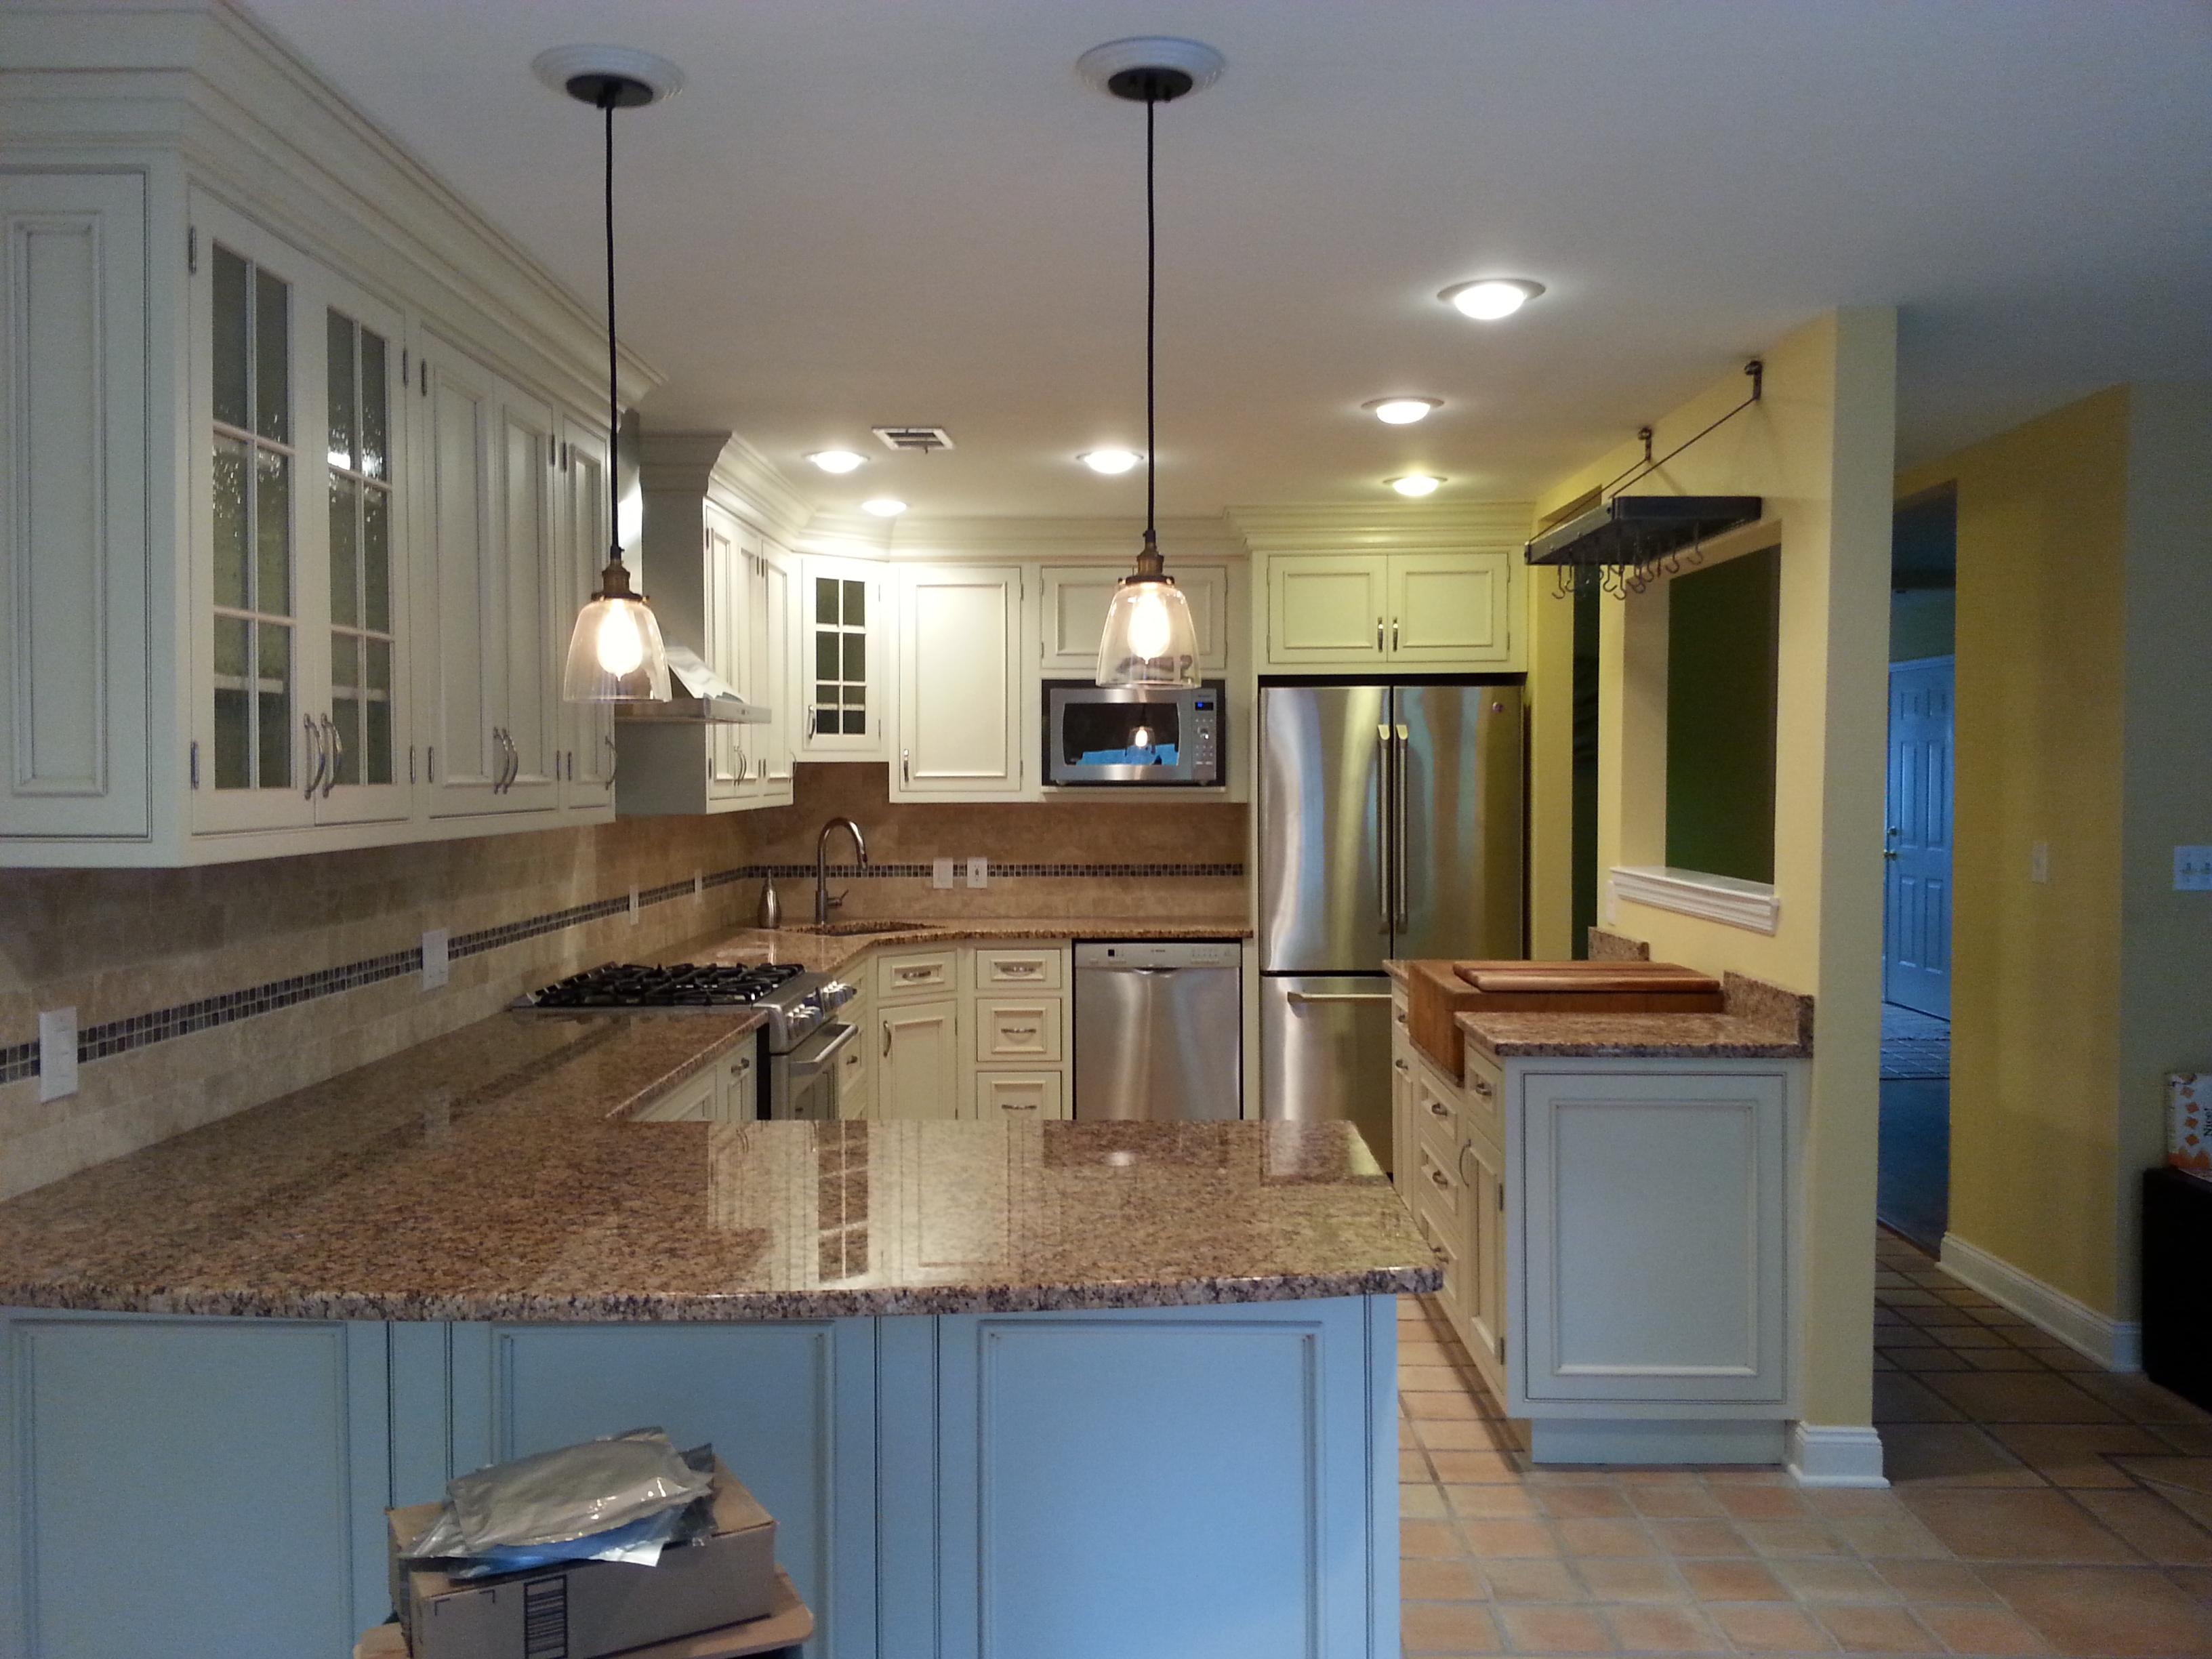 Dreamhouse Construction, LLC image 4